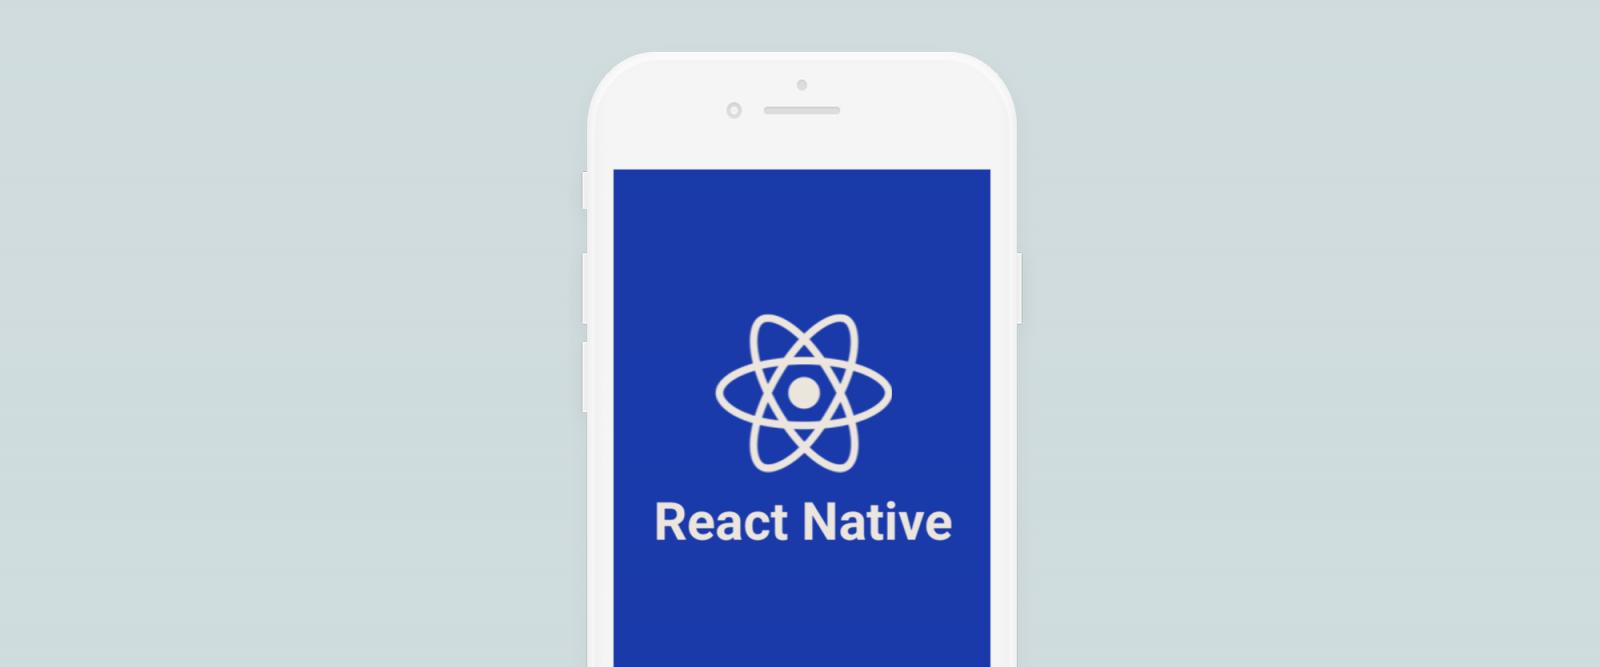 React Native mobiilisovelluksen teknologiaksi